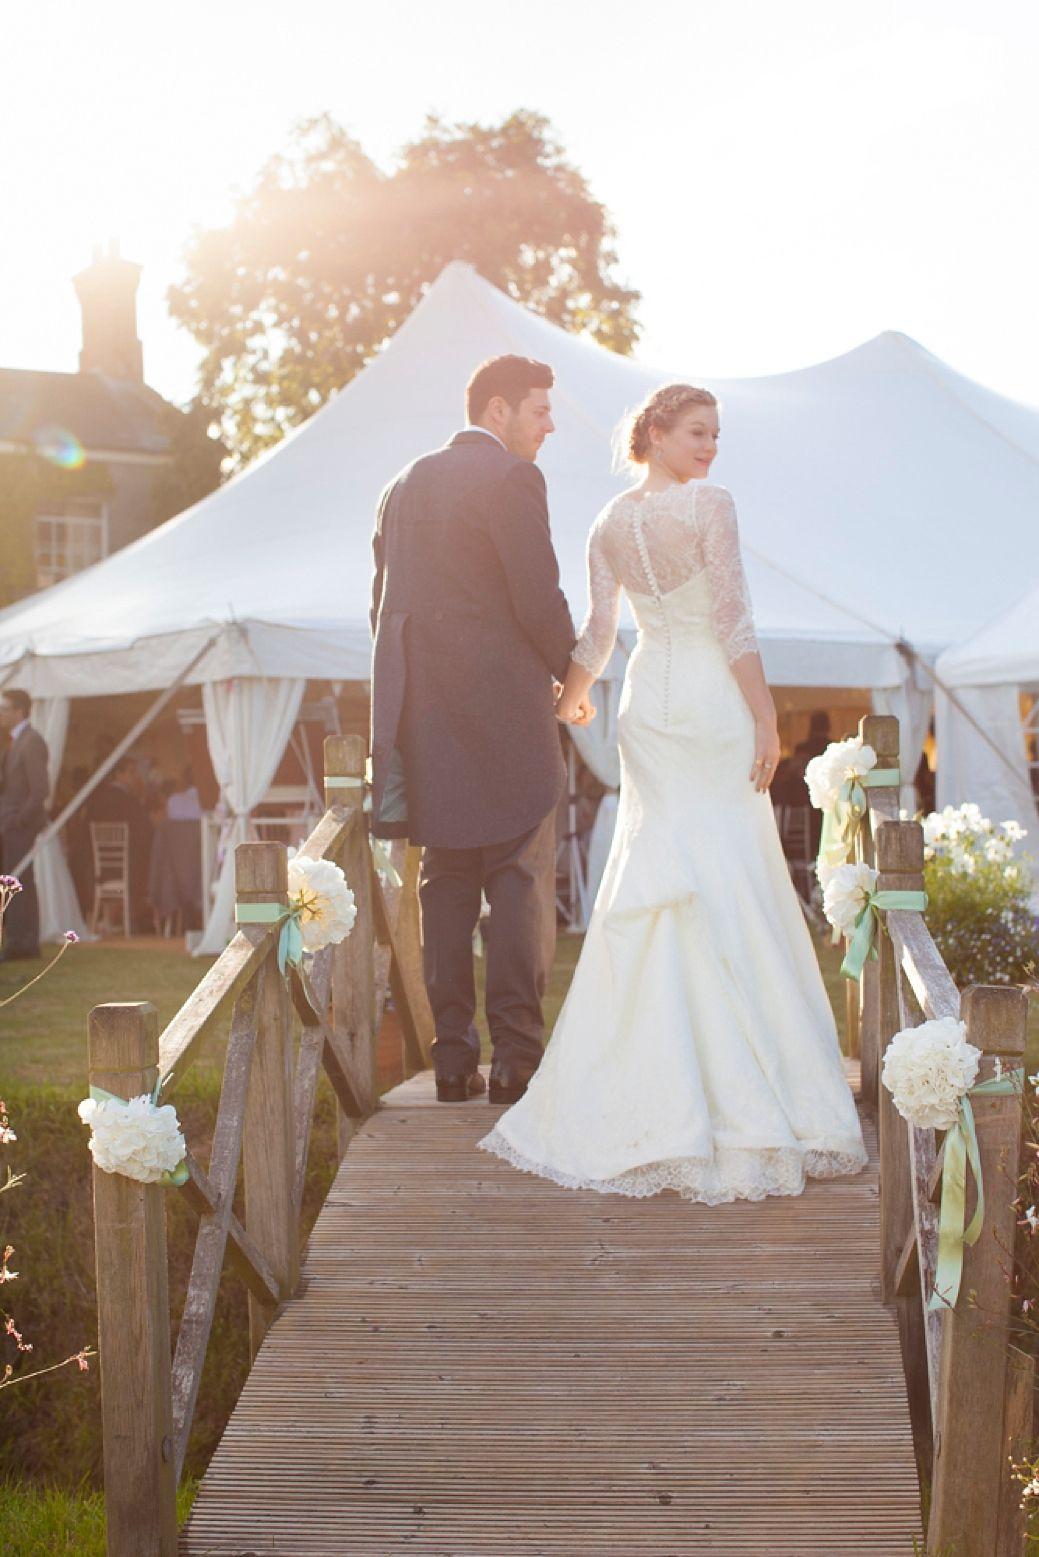 Bride and groom kerry bartlett photography summer wedding